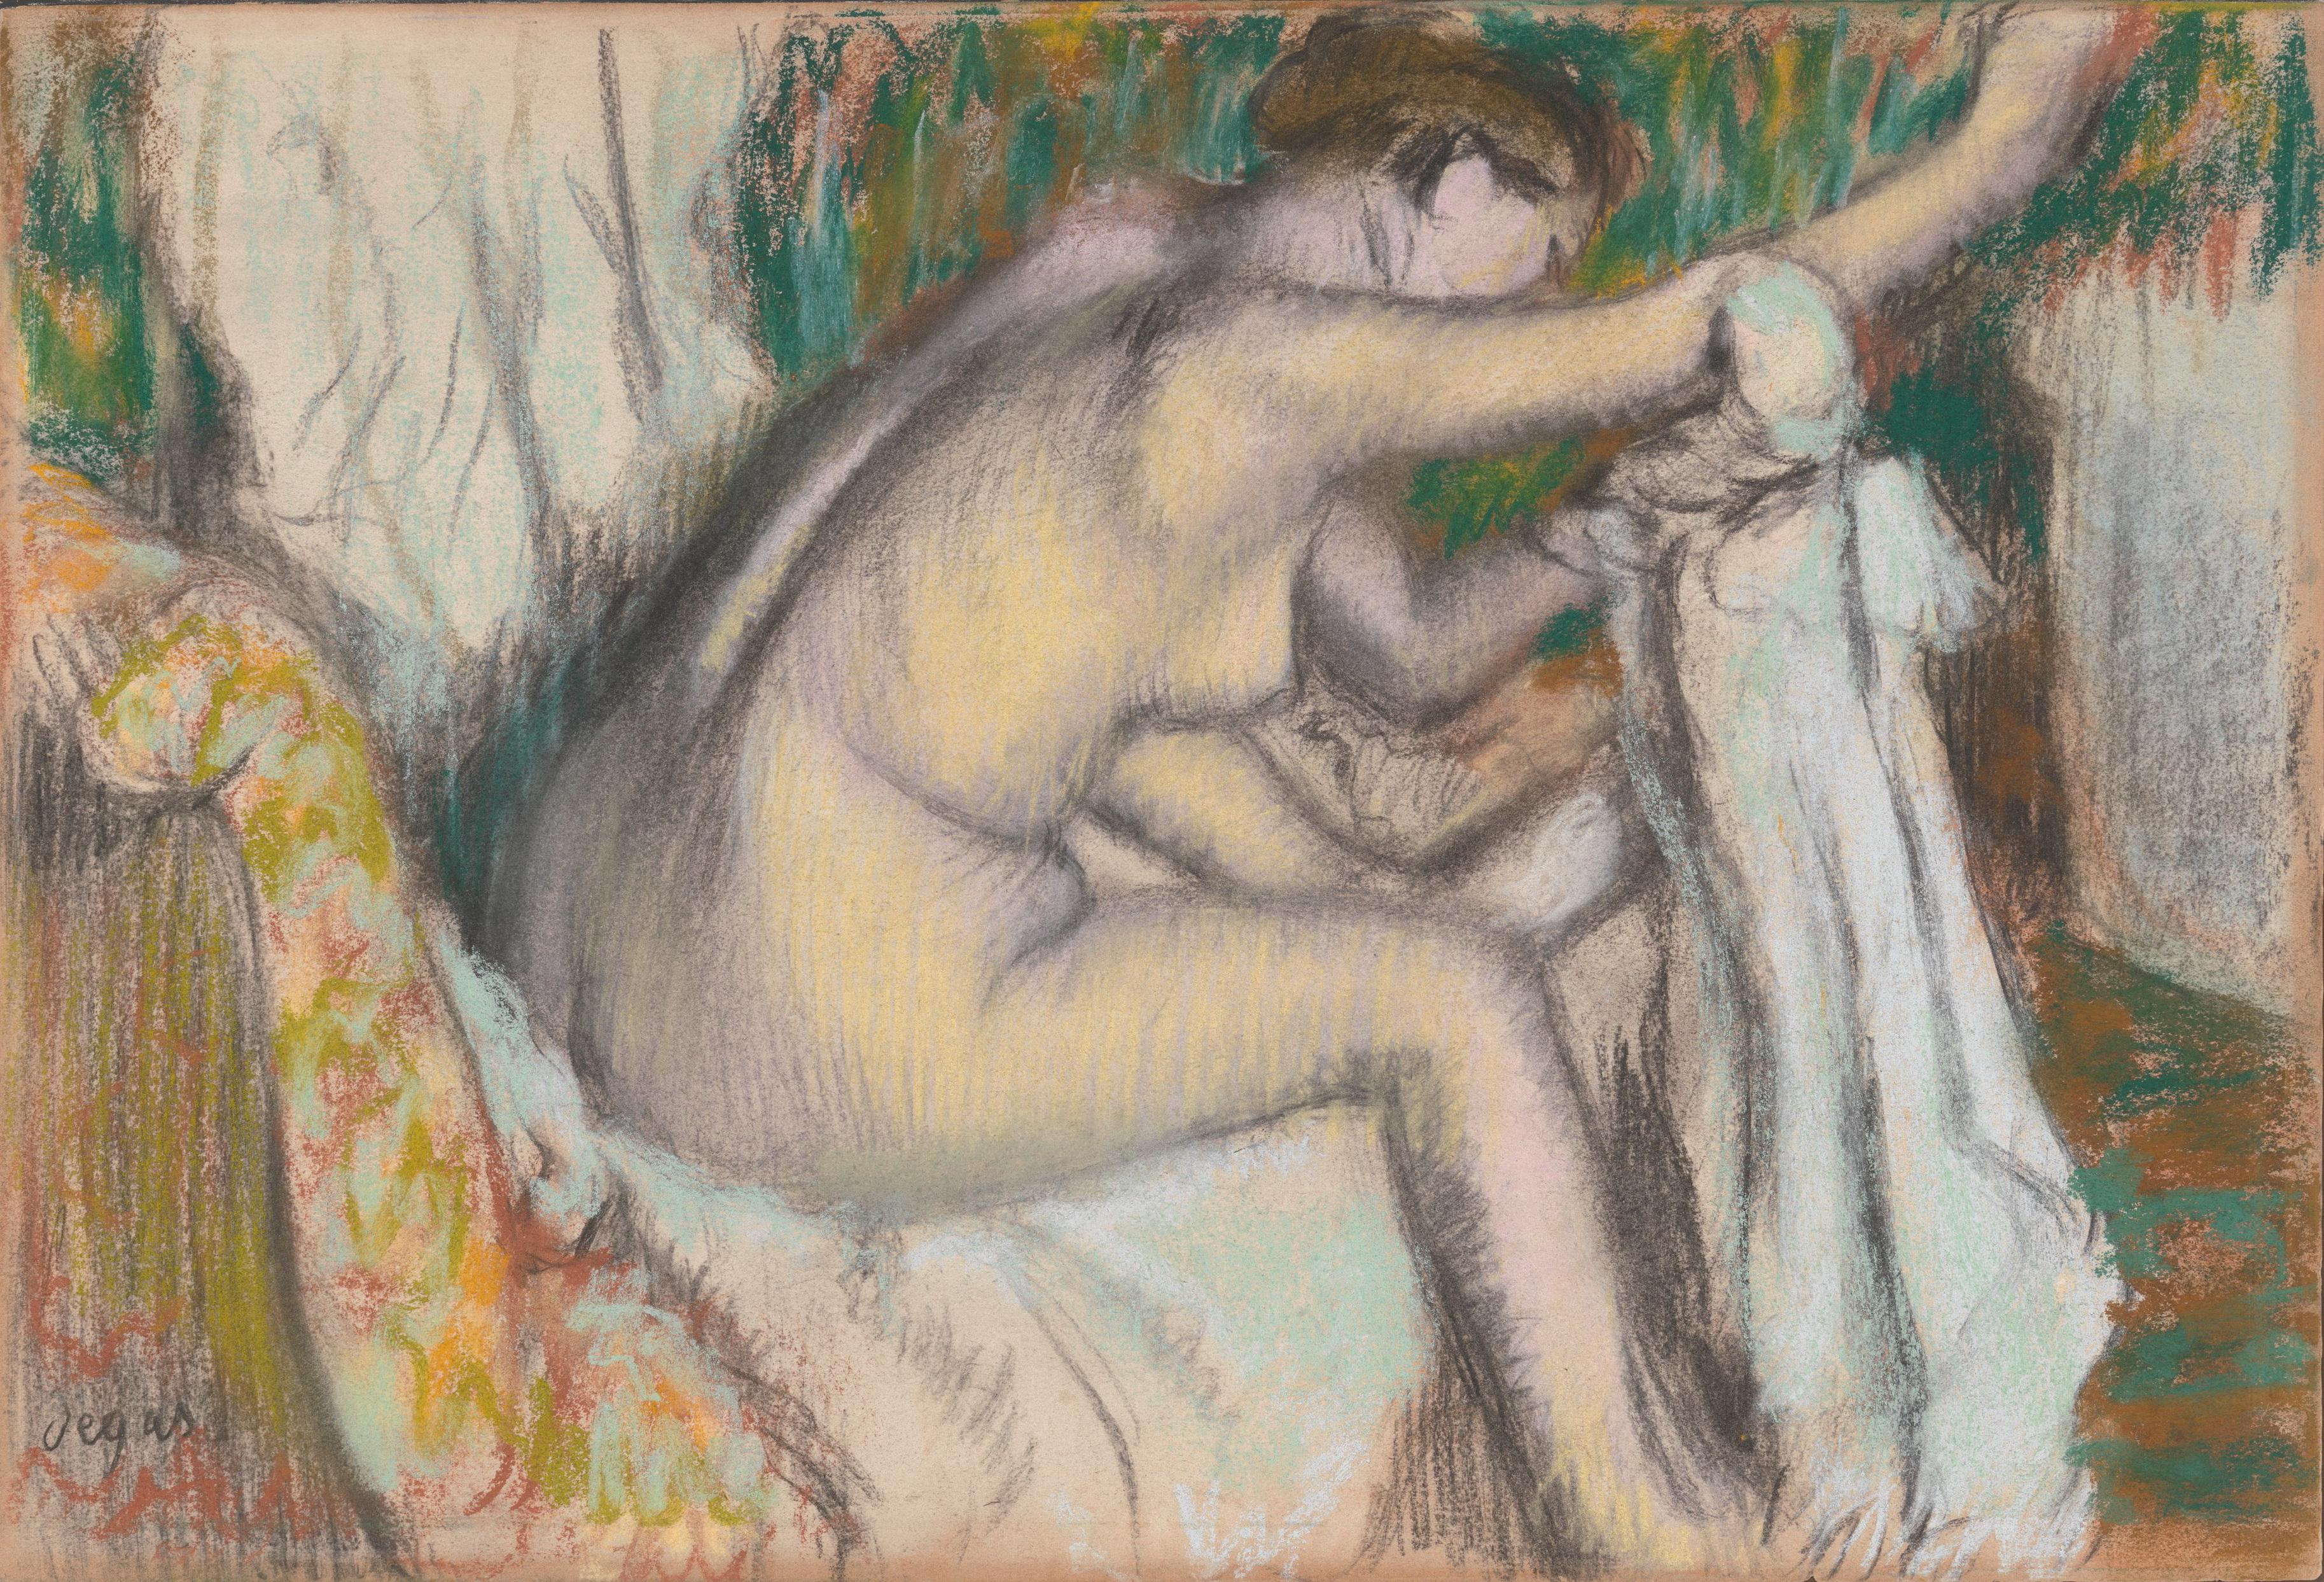 Edgar Degas, 1834-1917. Женщина, вытирающая руку. 1880-1890-е. 30.5 х 44.5 см. Нью-Йорк, Метрополитен